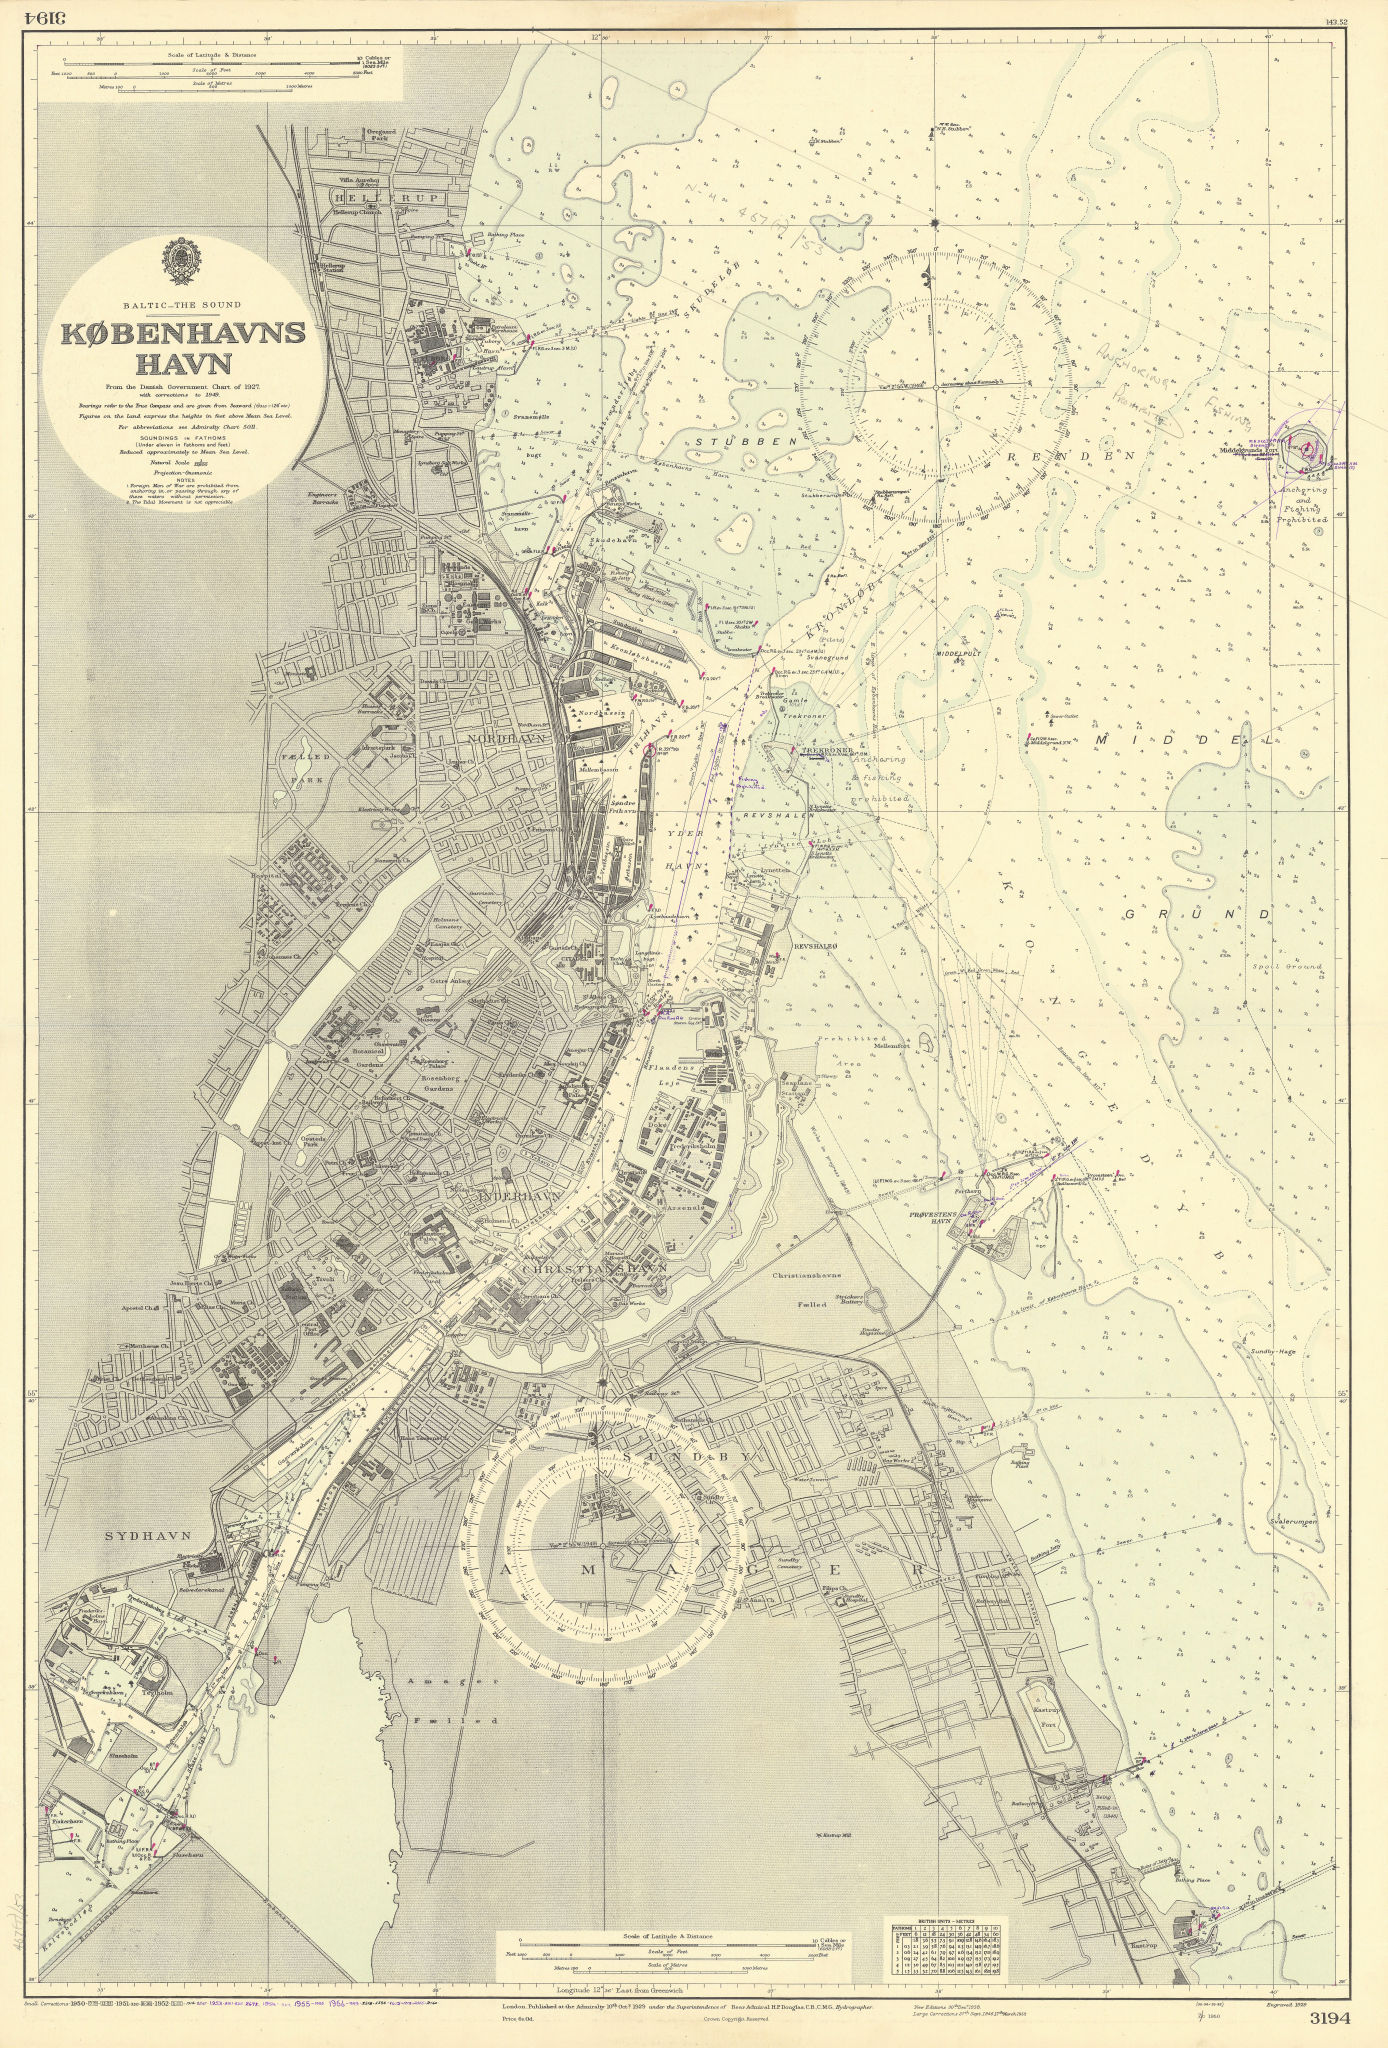 Københavns Havn Copenhagen Denmark ADMIRALTY sea chart city plan 1929 (1956) map